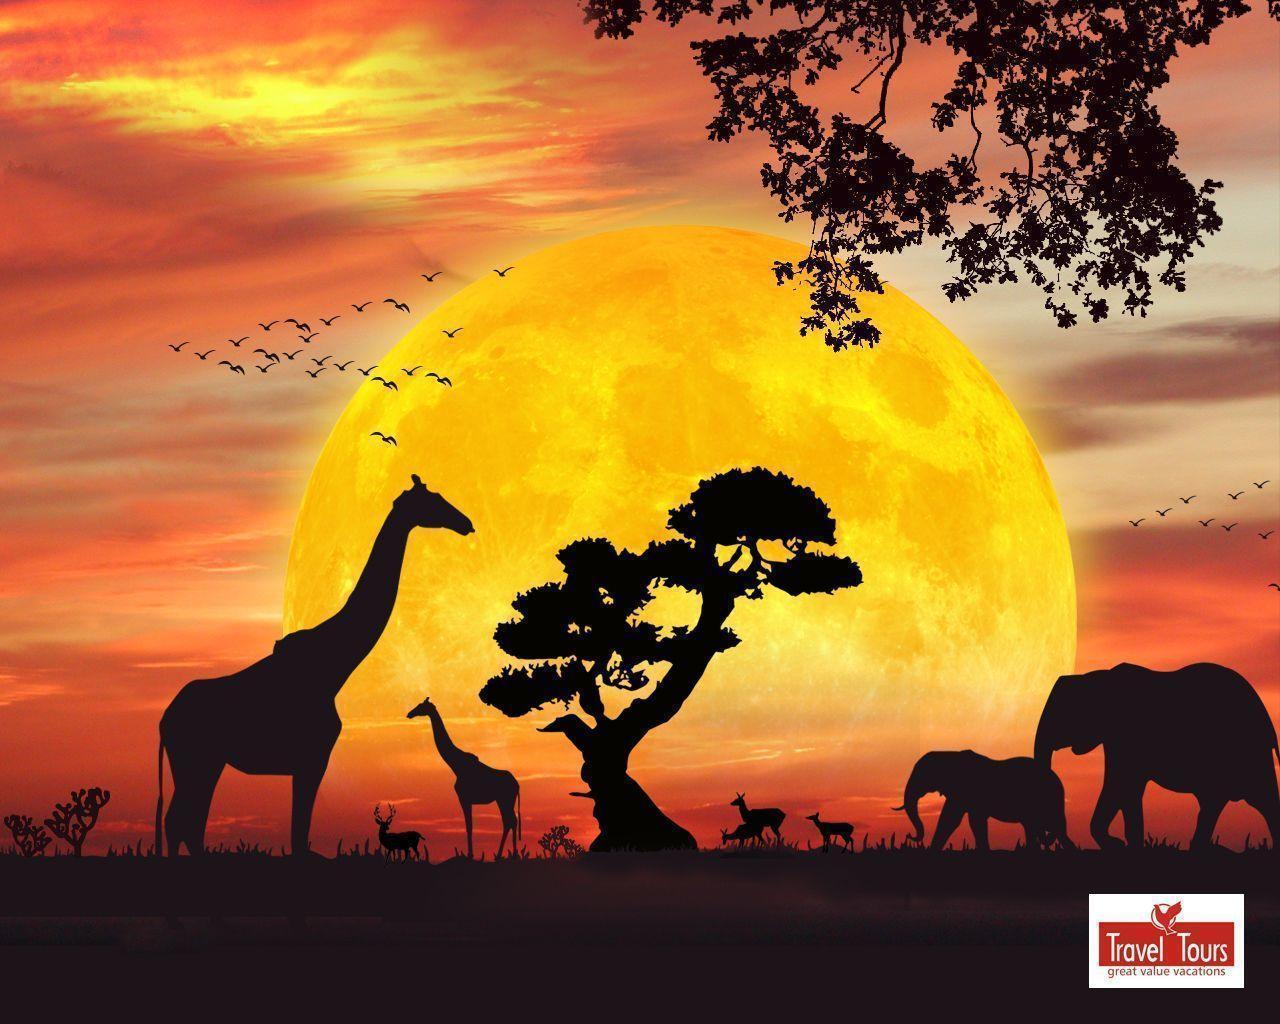 safari cartoon wallpaper - photo #17